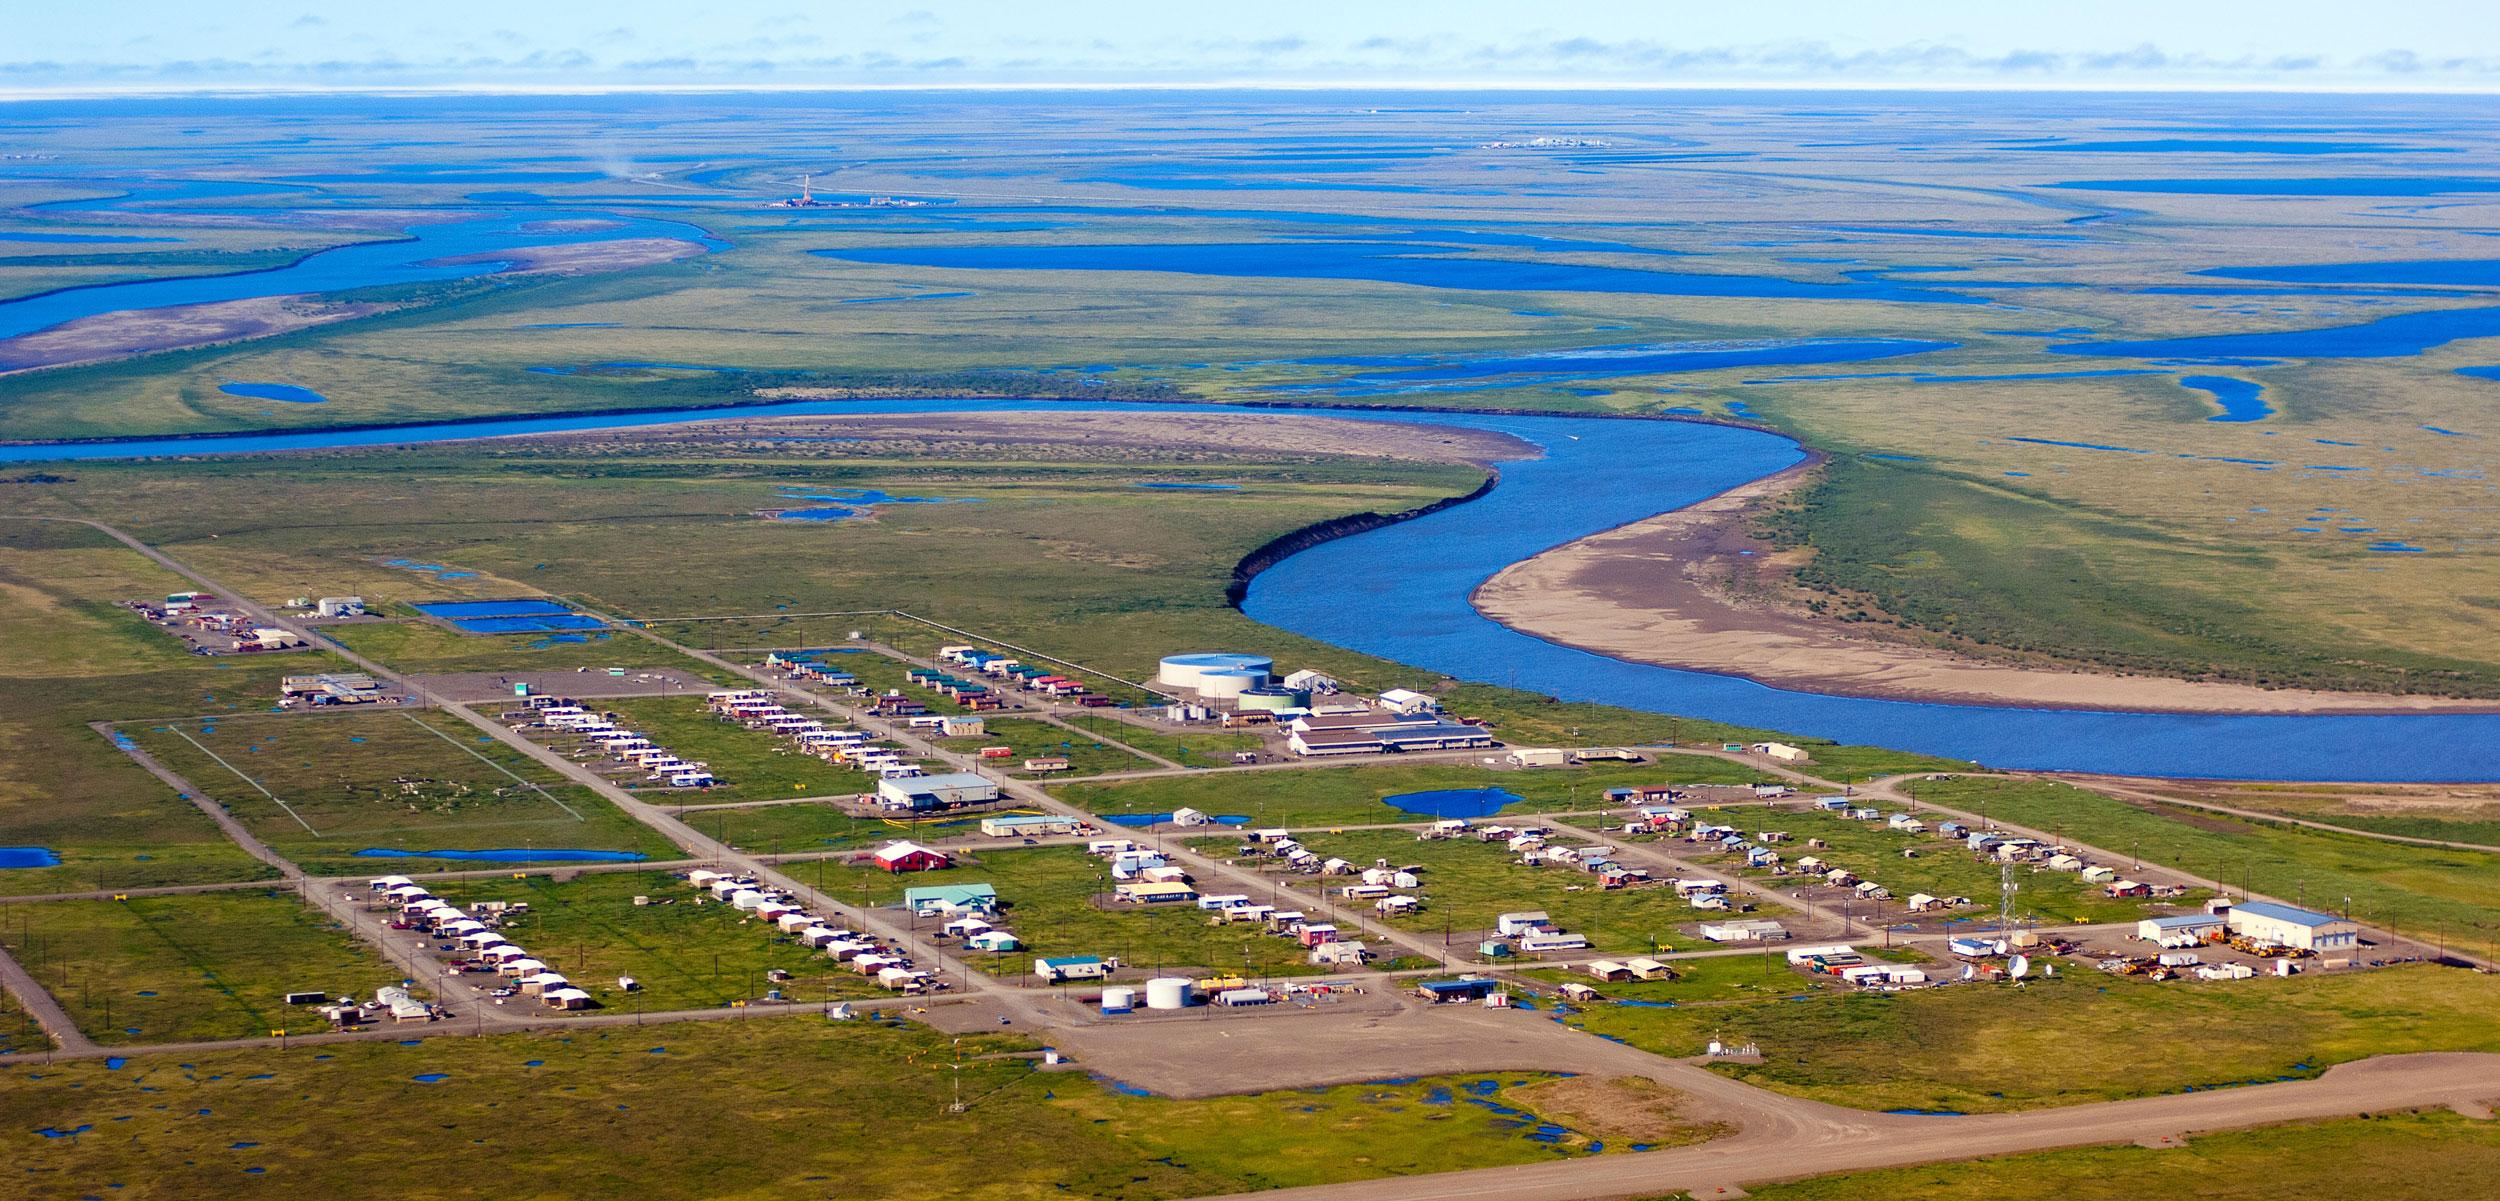 Aerial photo of Nuiqsut, Alaska